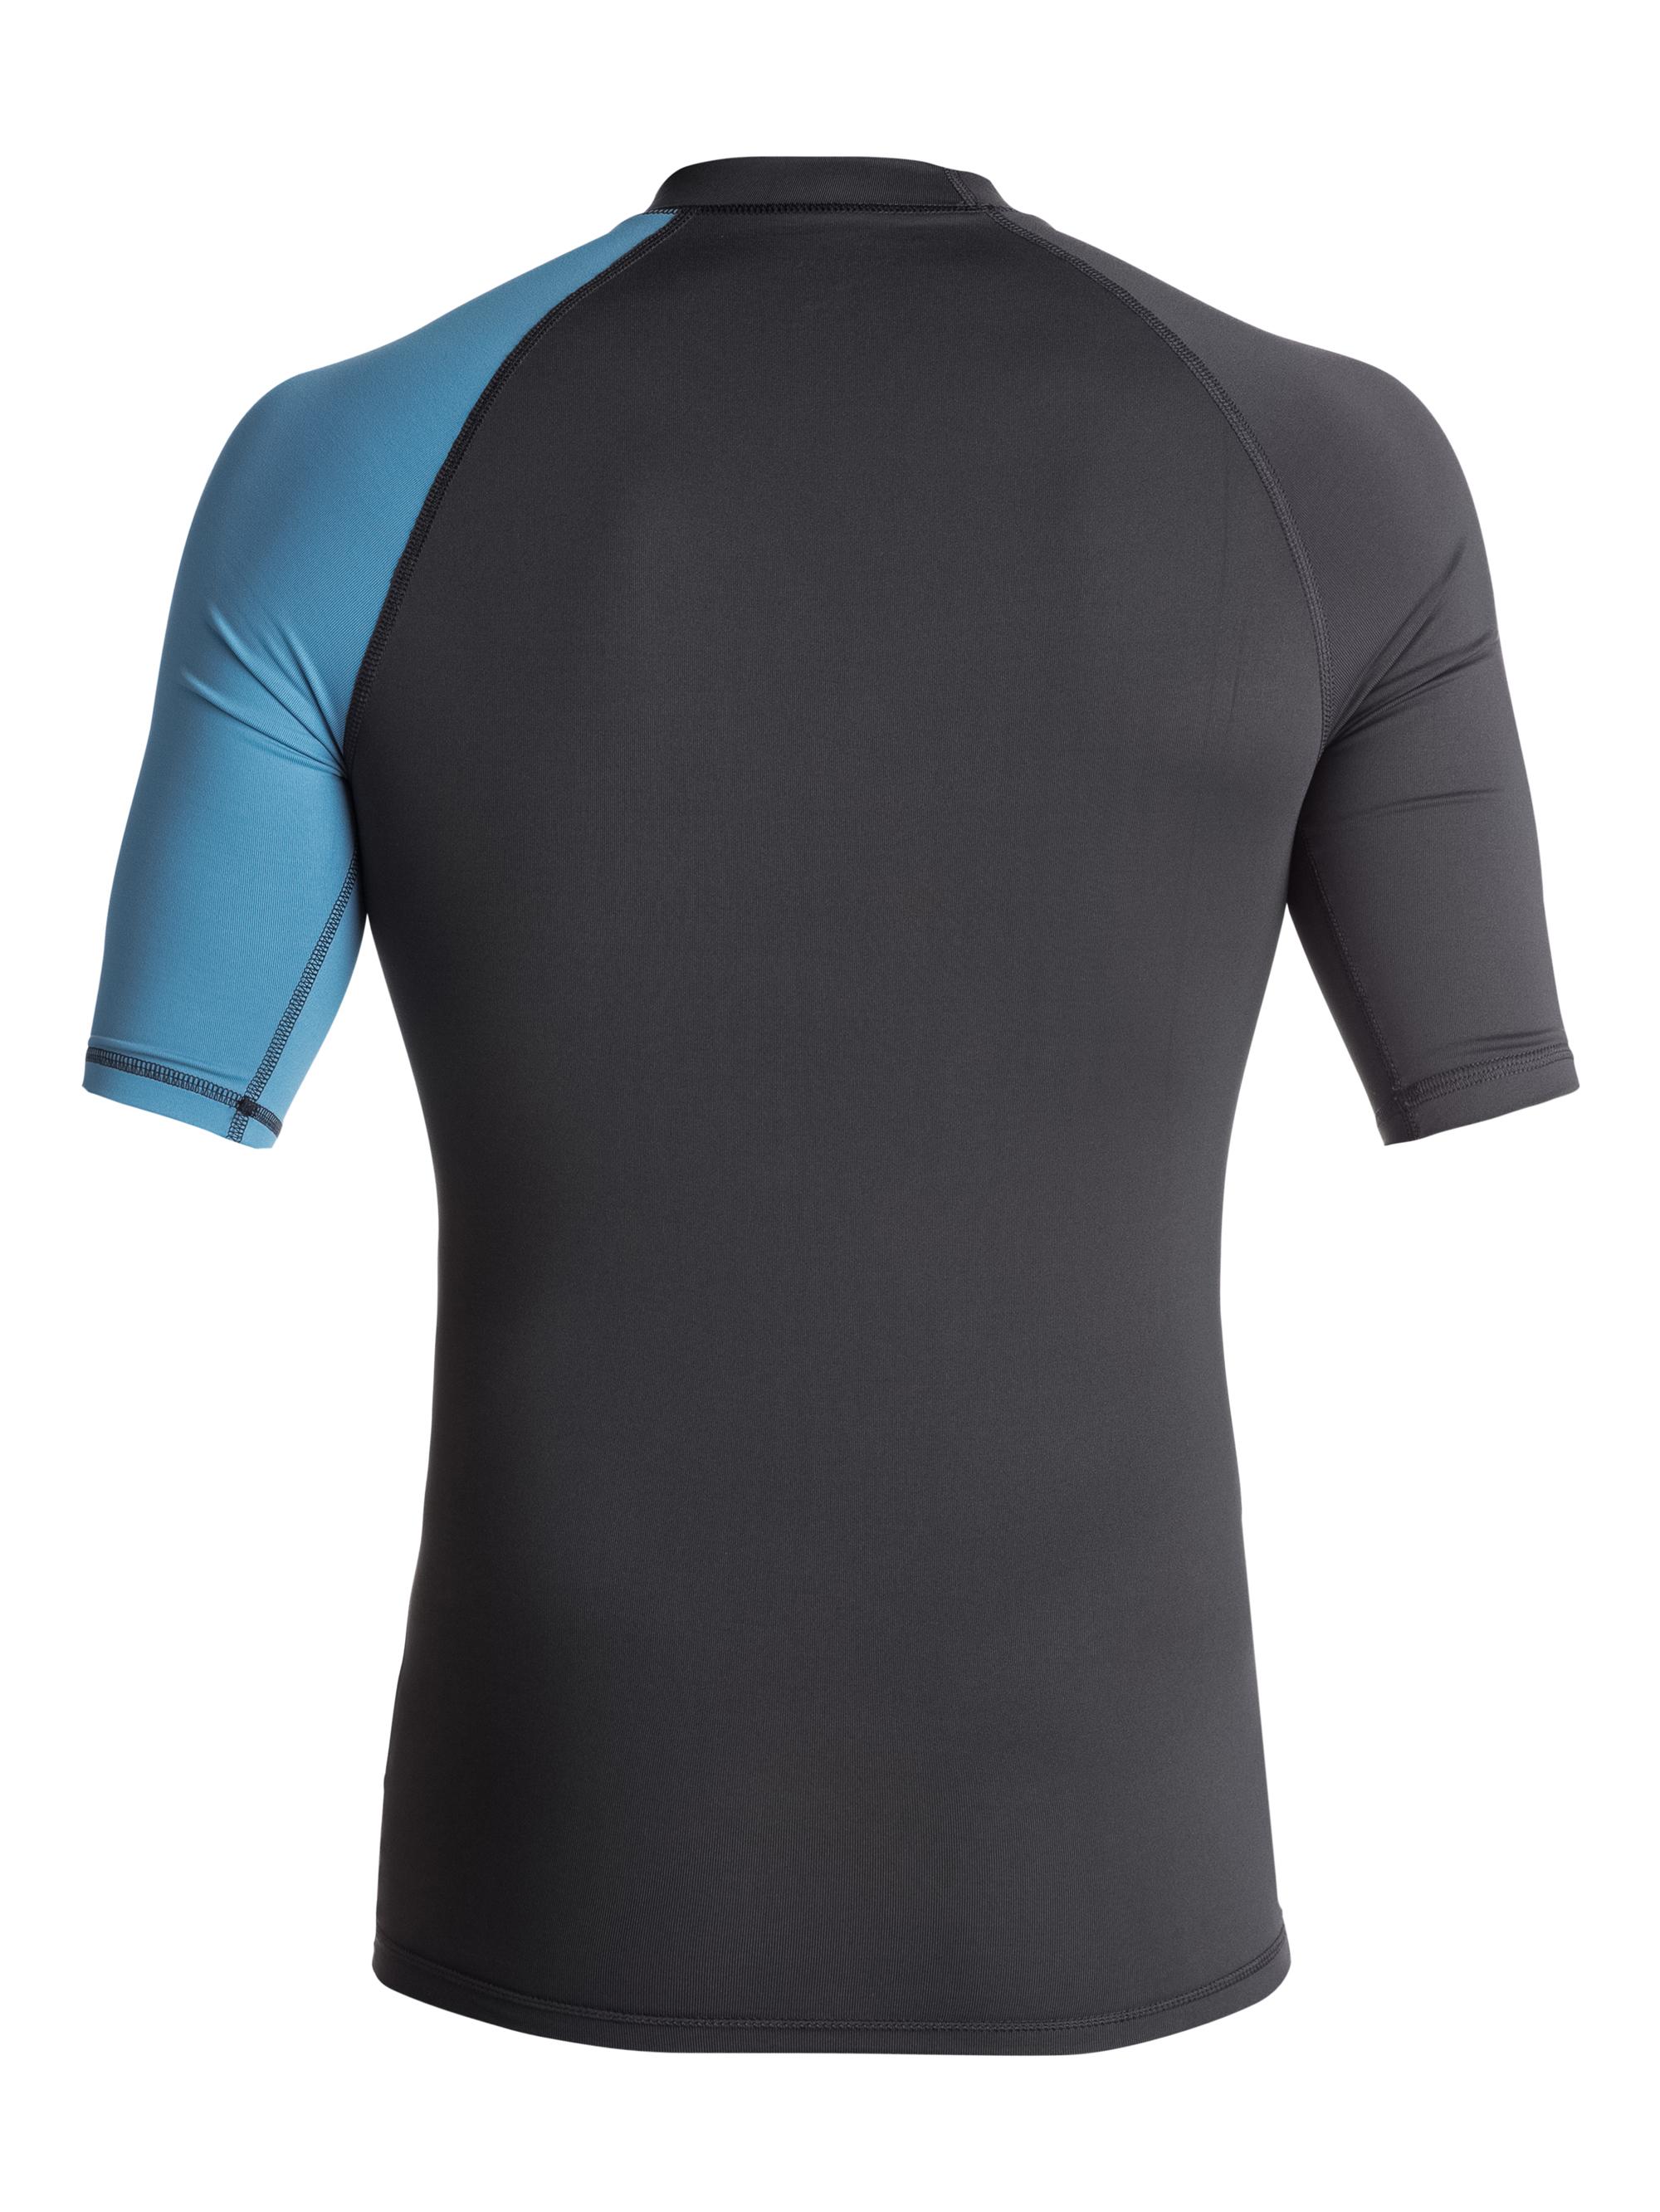 Lycra Quiksilver Active Shortsleeve Rashguard (Tarmac / Cendre Blue) Ss18